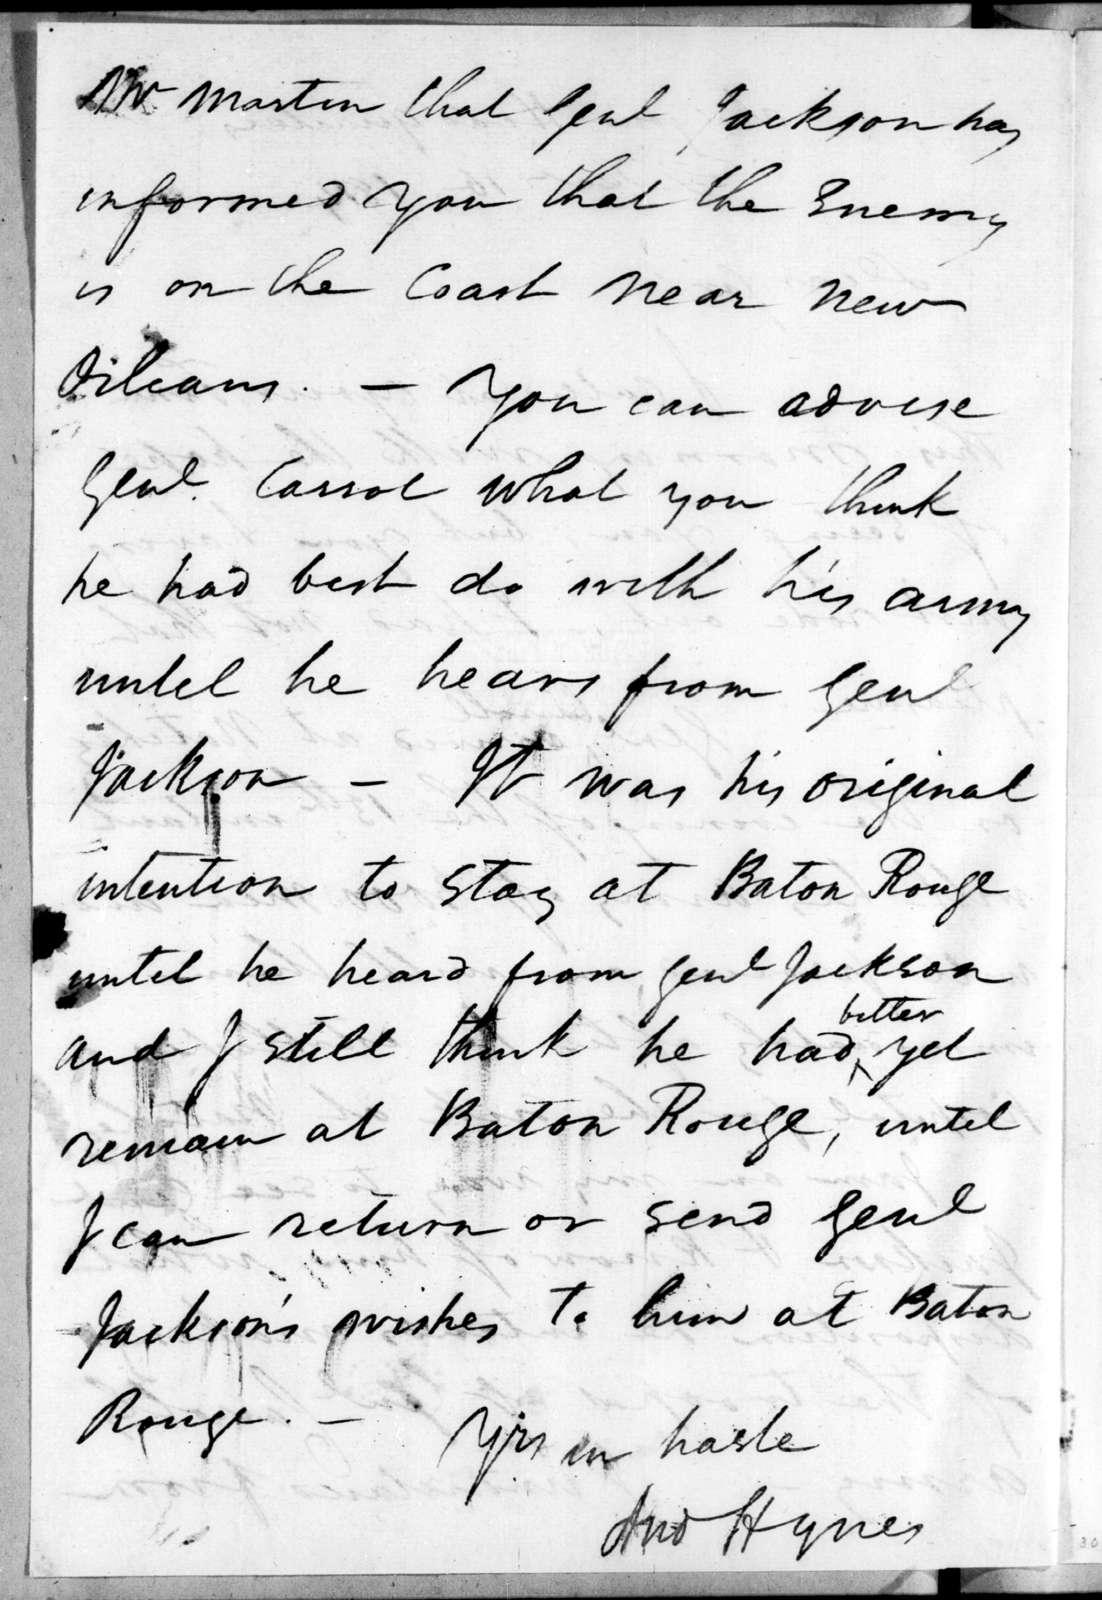 Andrew Hynes to John Coffee, December 16, 1814